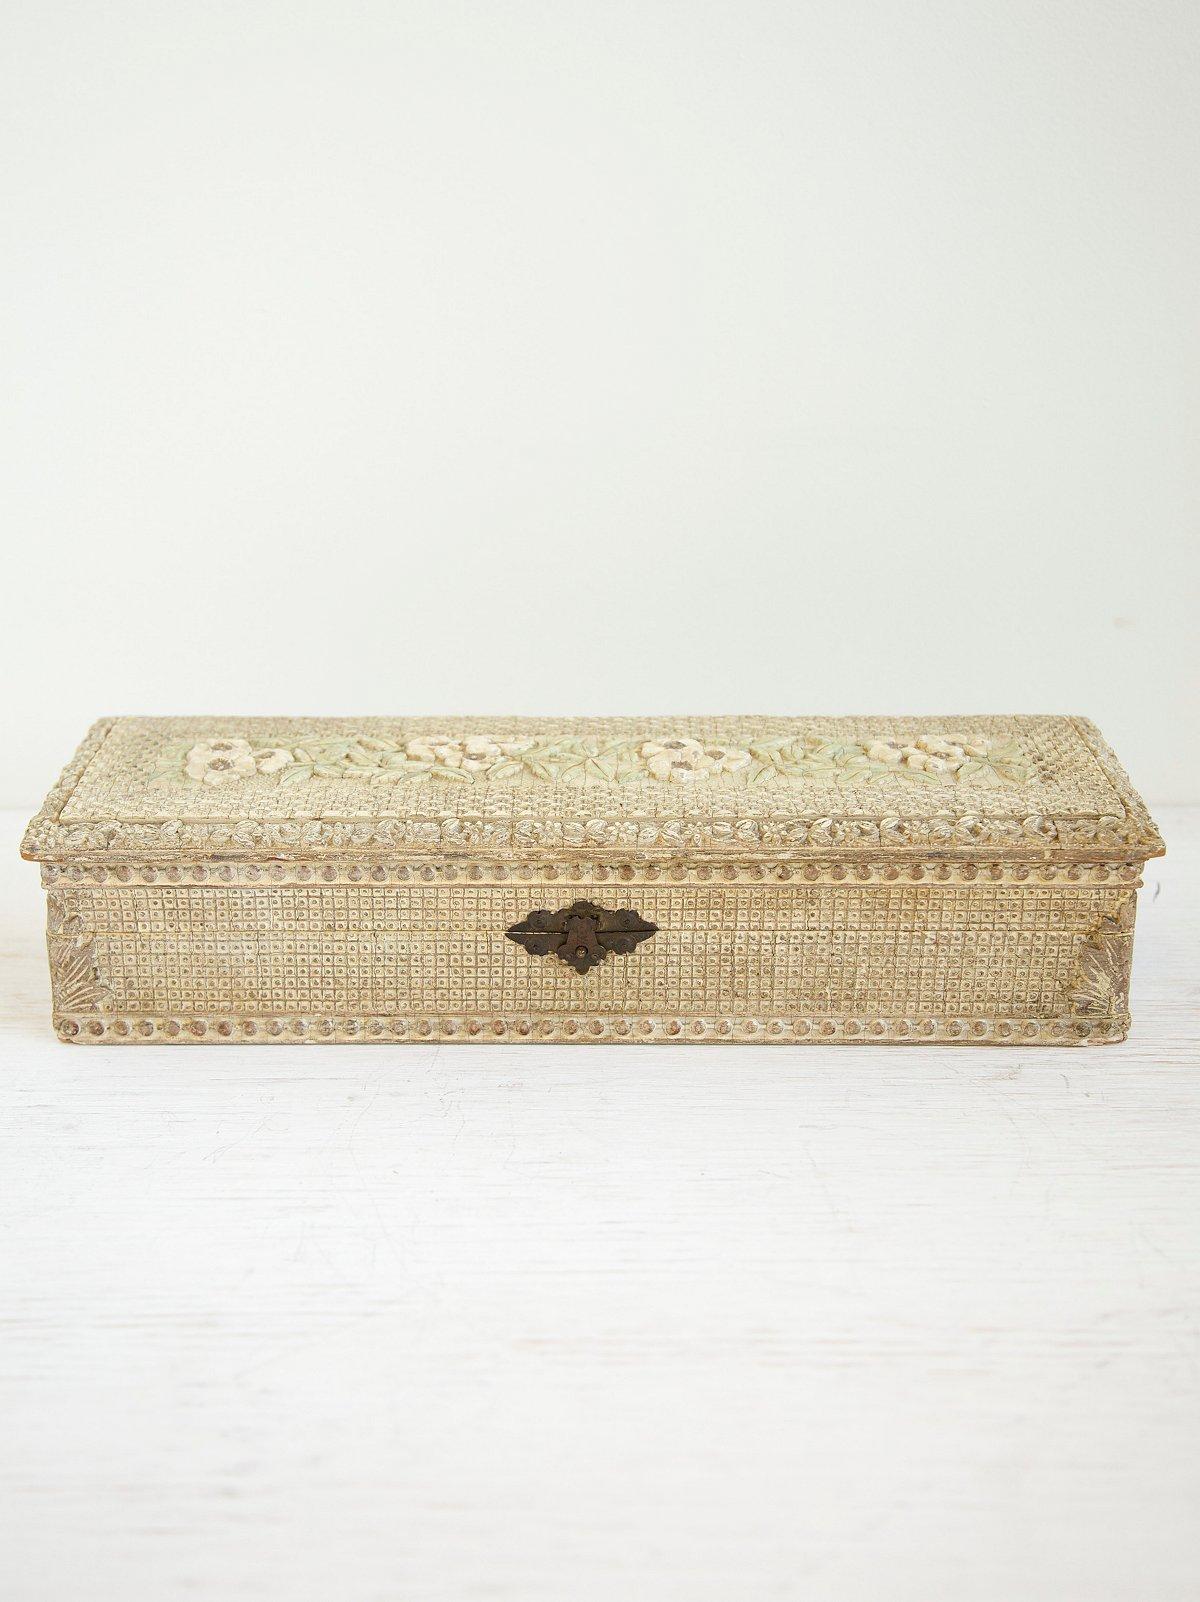 Vintage Celluloid Jewel Box